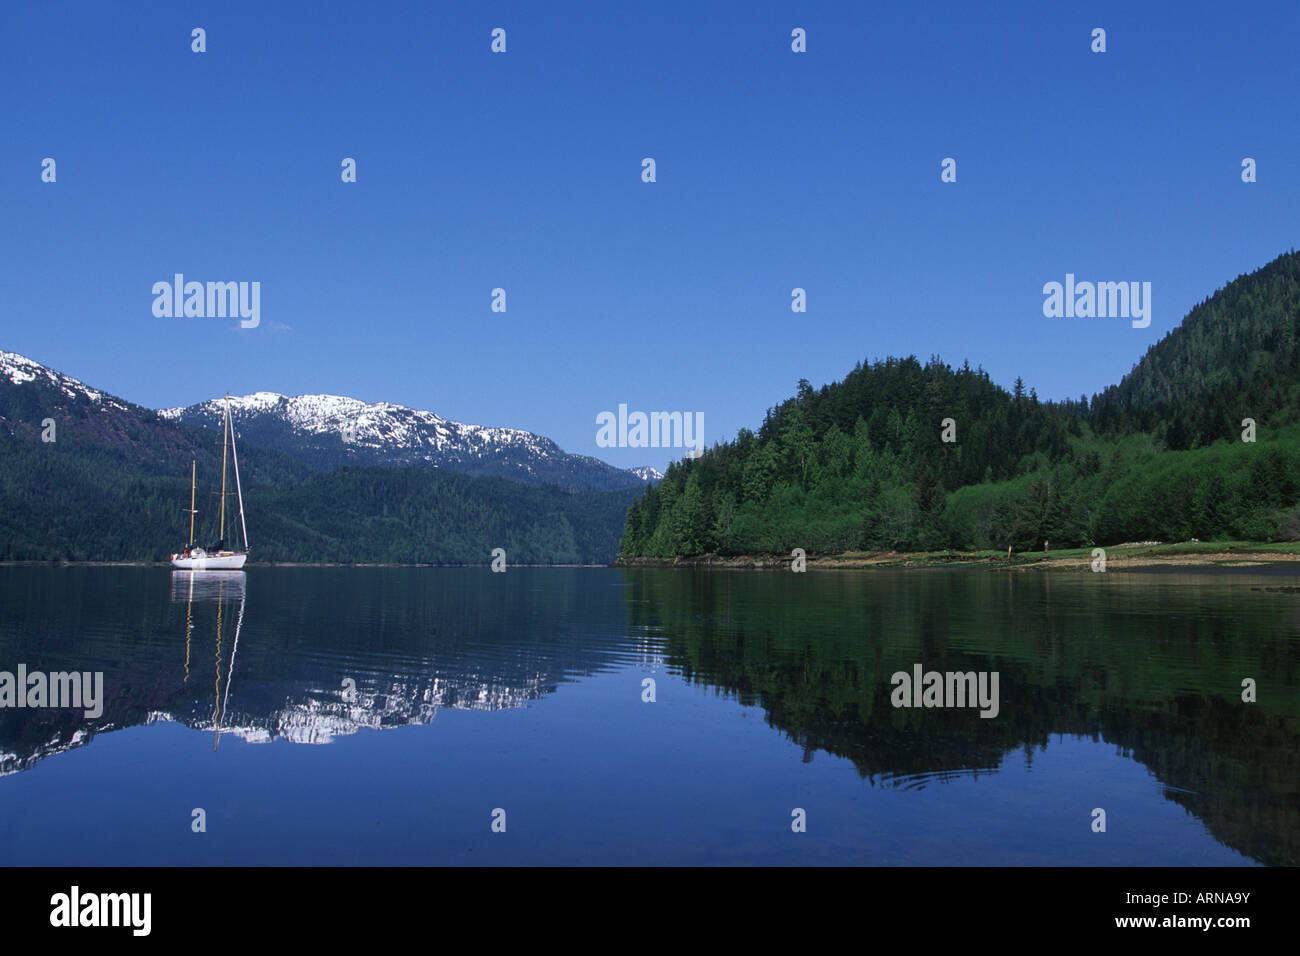 Khutzeymateen Inlet, ecotour sailboat, British Columbia, Canada. - Stock Image